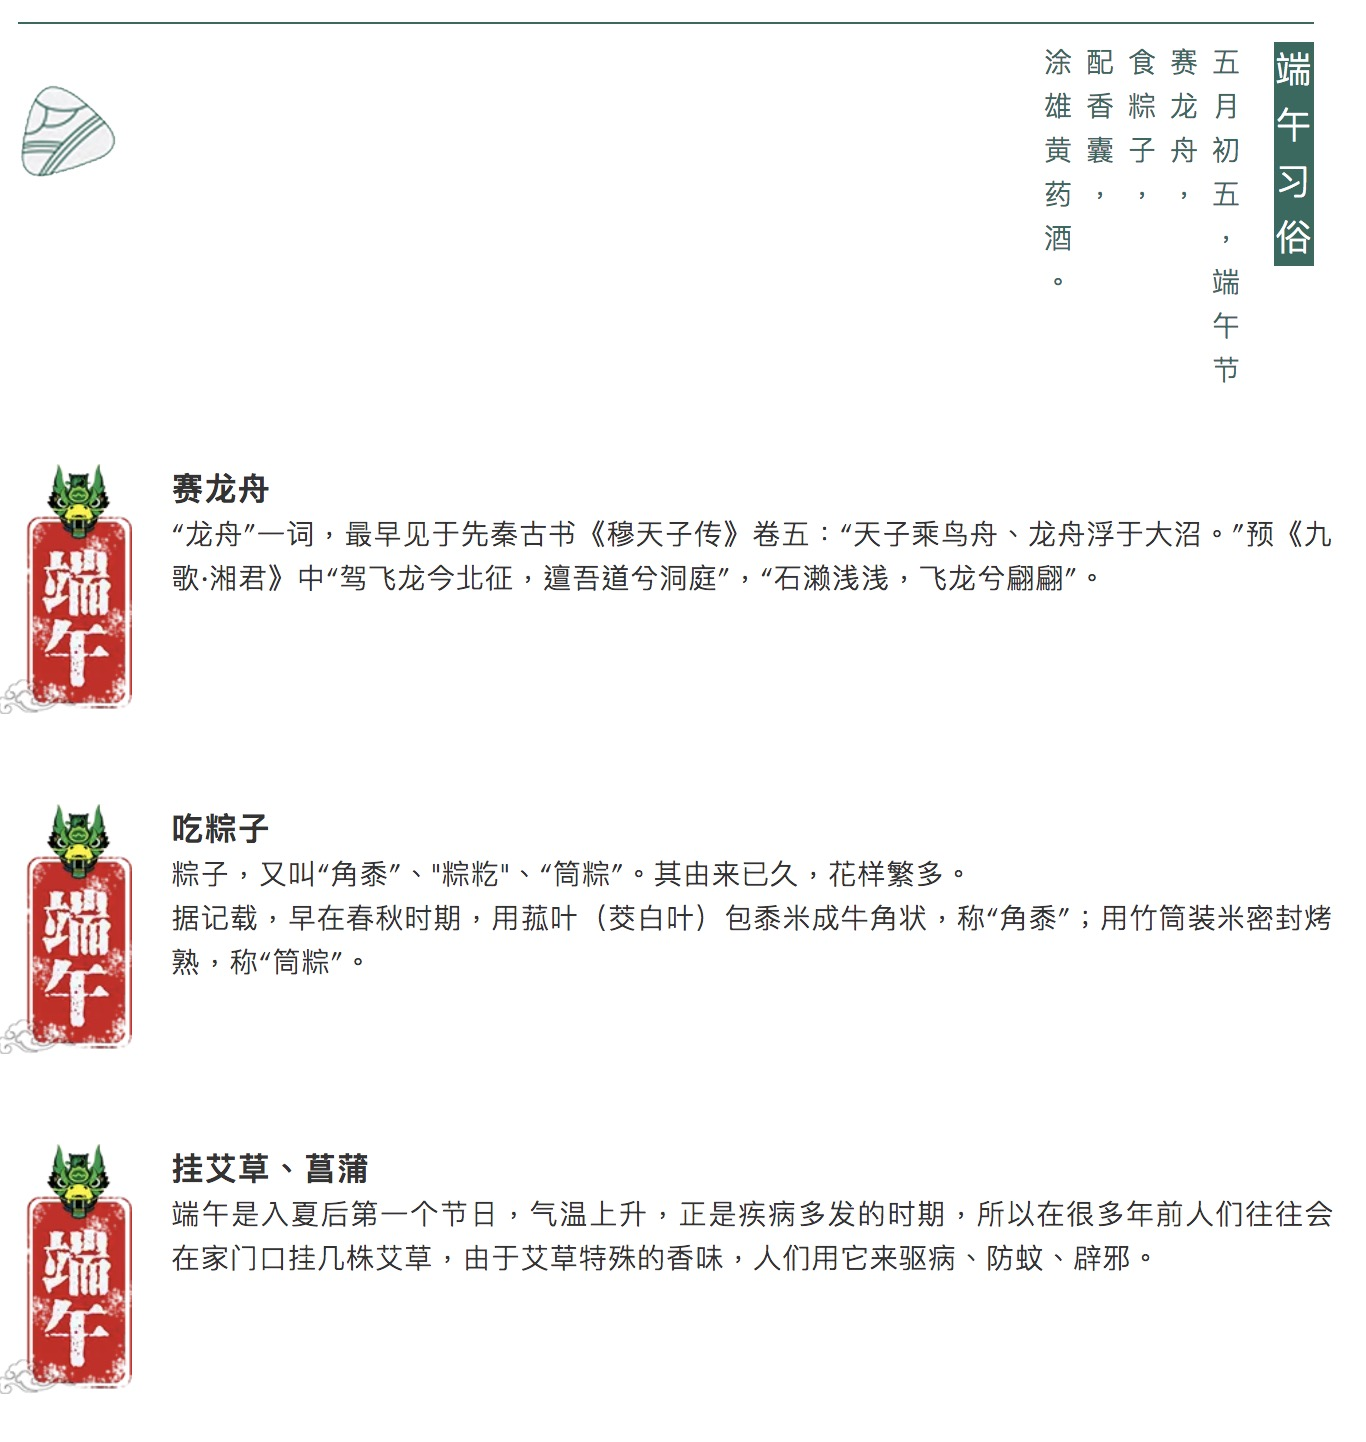 https://momo-mmsrc.oss-cn-hangzhou.aliyuncs.com/img-8c536b11-94fc-3885-ba12-81192e21b065.jpeg